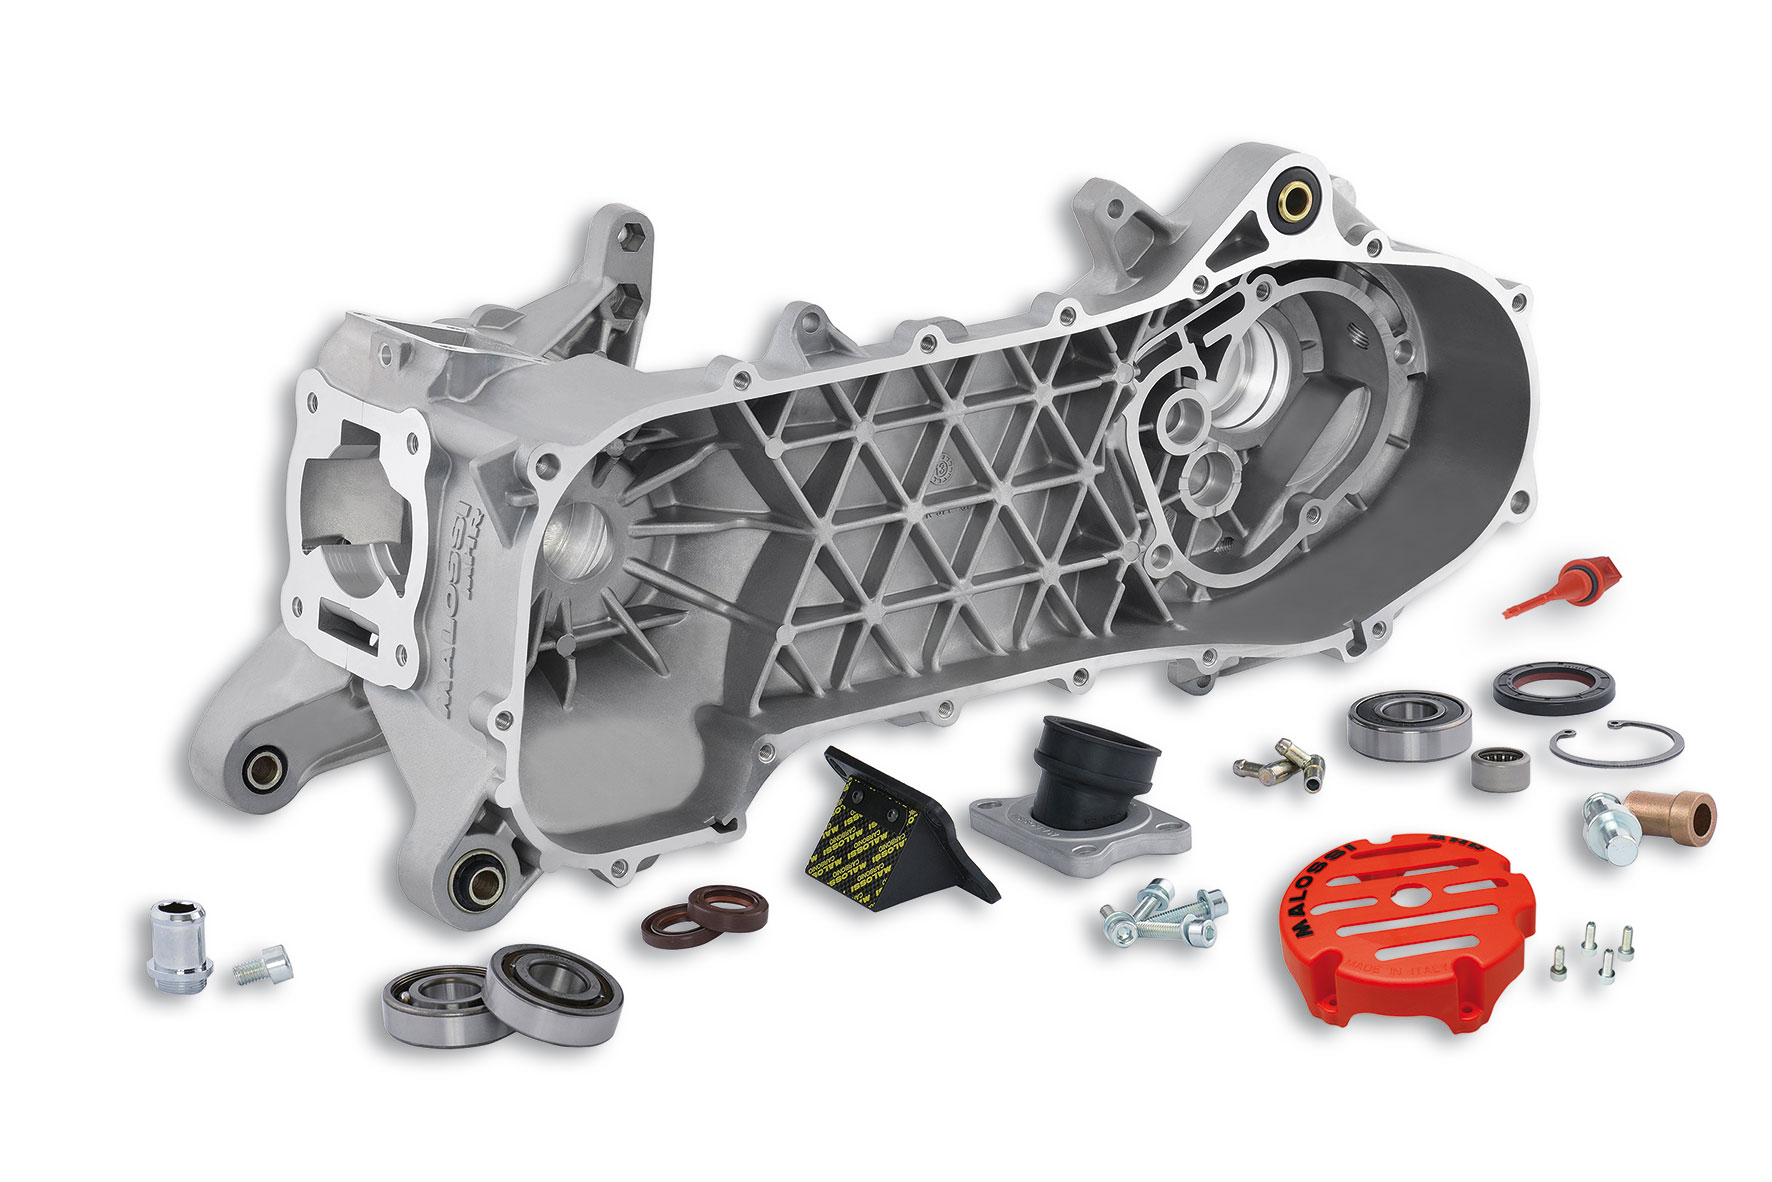 § MHR RC-one COMPL. ENGINE CRANKCASE (for PIAGGIO engine)